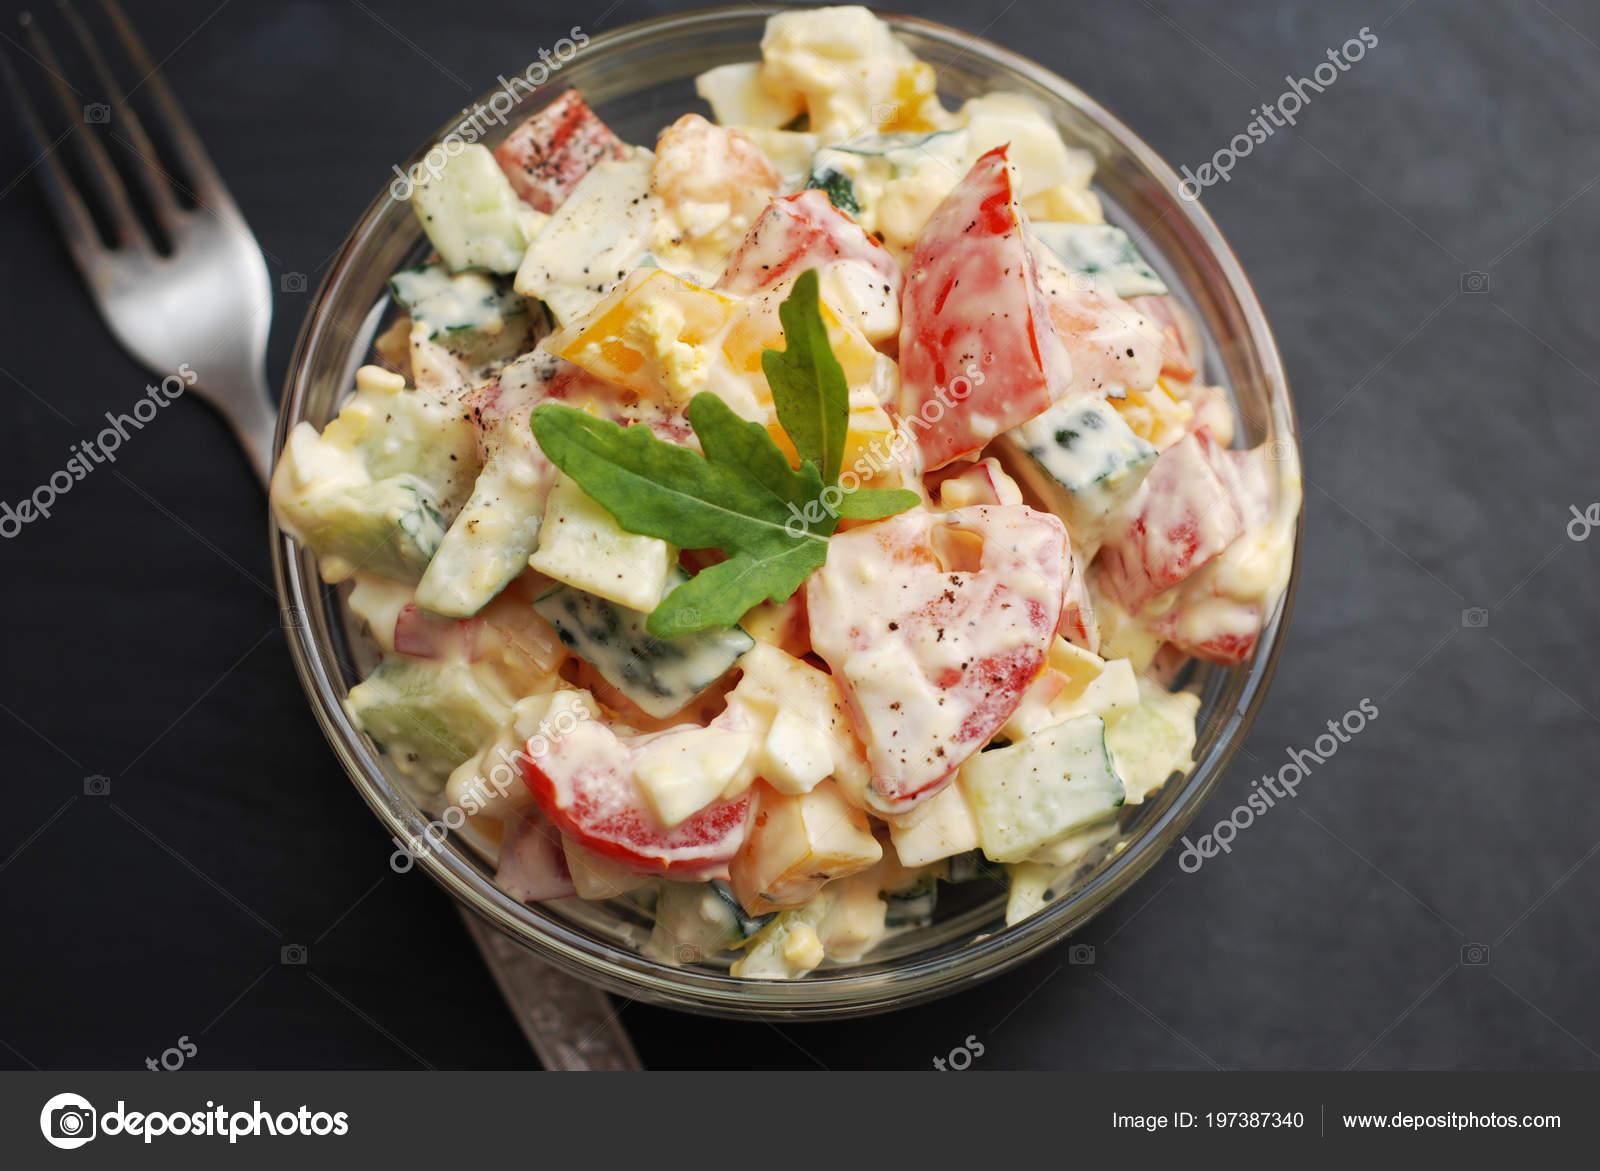 Salat Aus Gemüse Paprika Tomaten Gurken Eier Und Mayonnaise